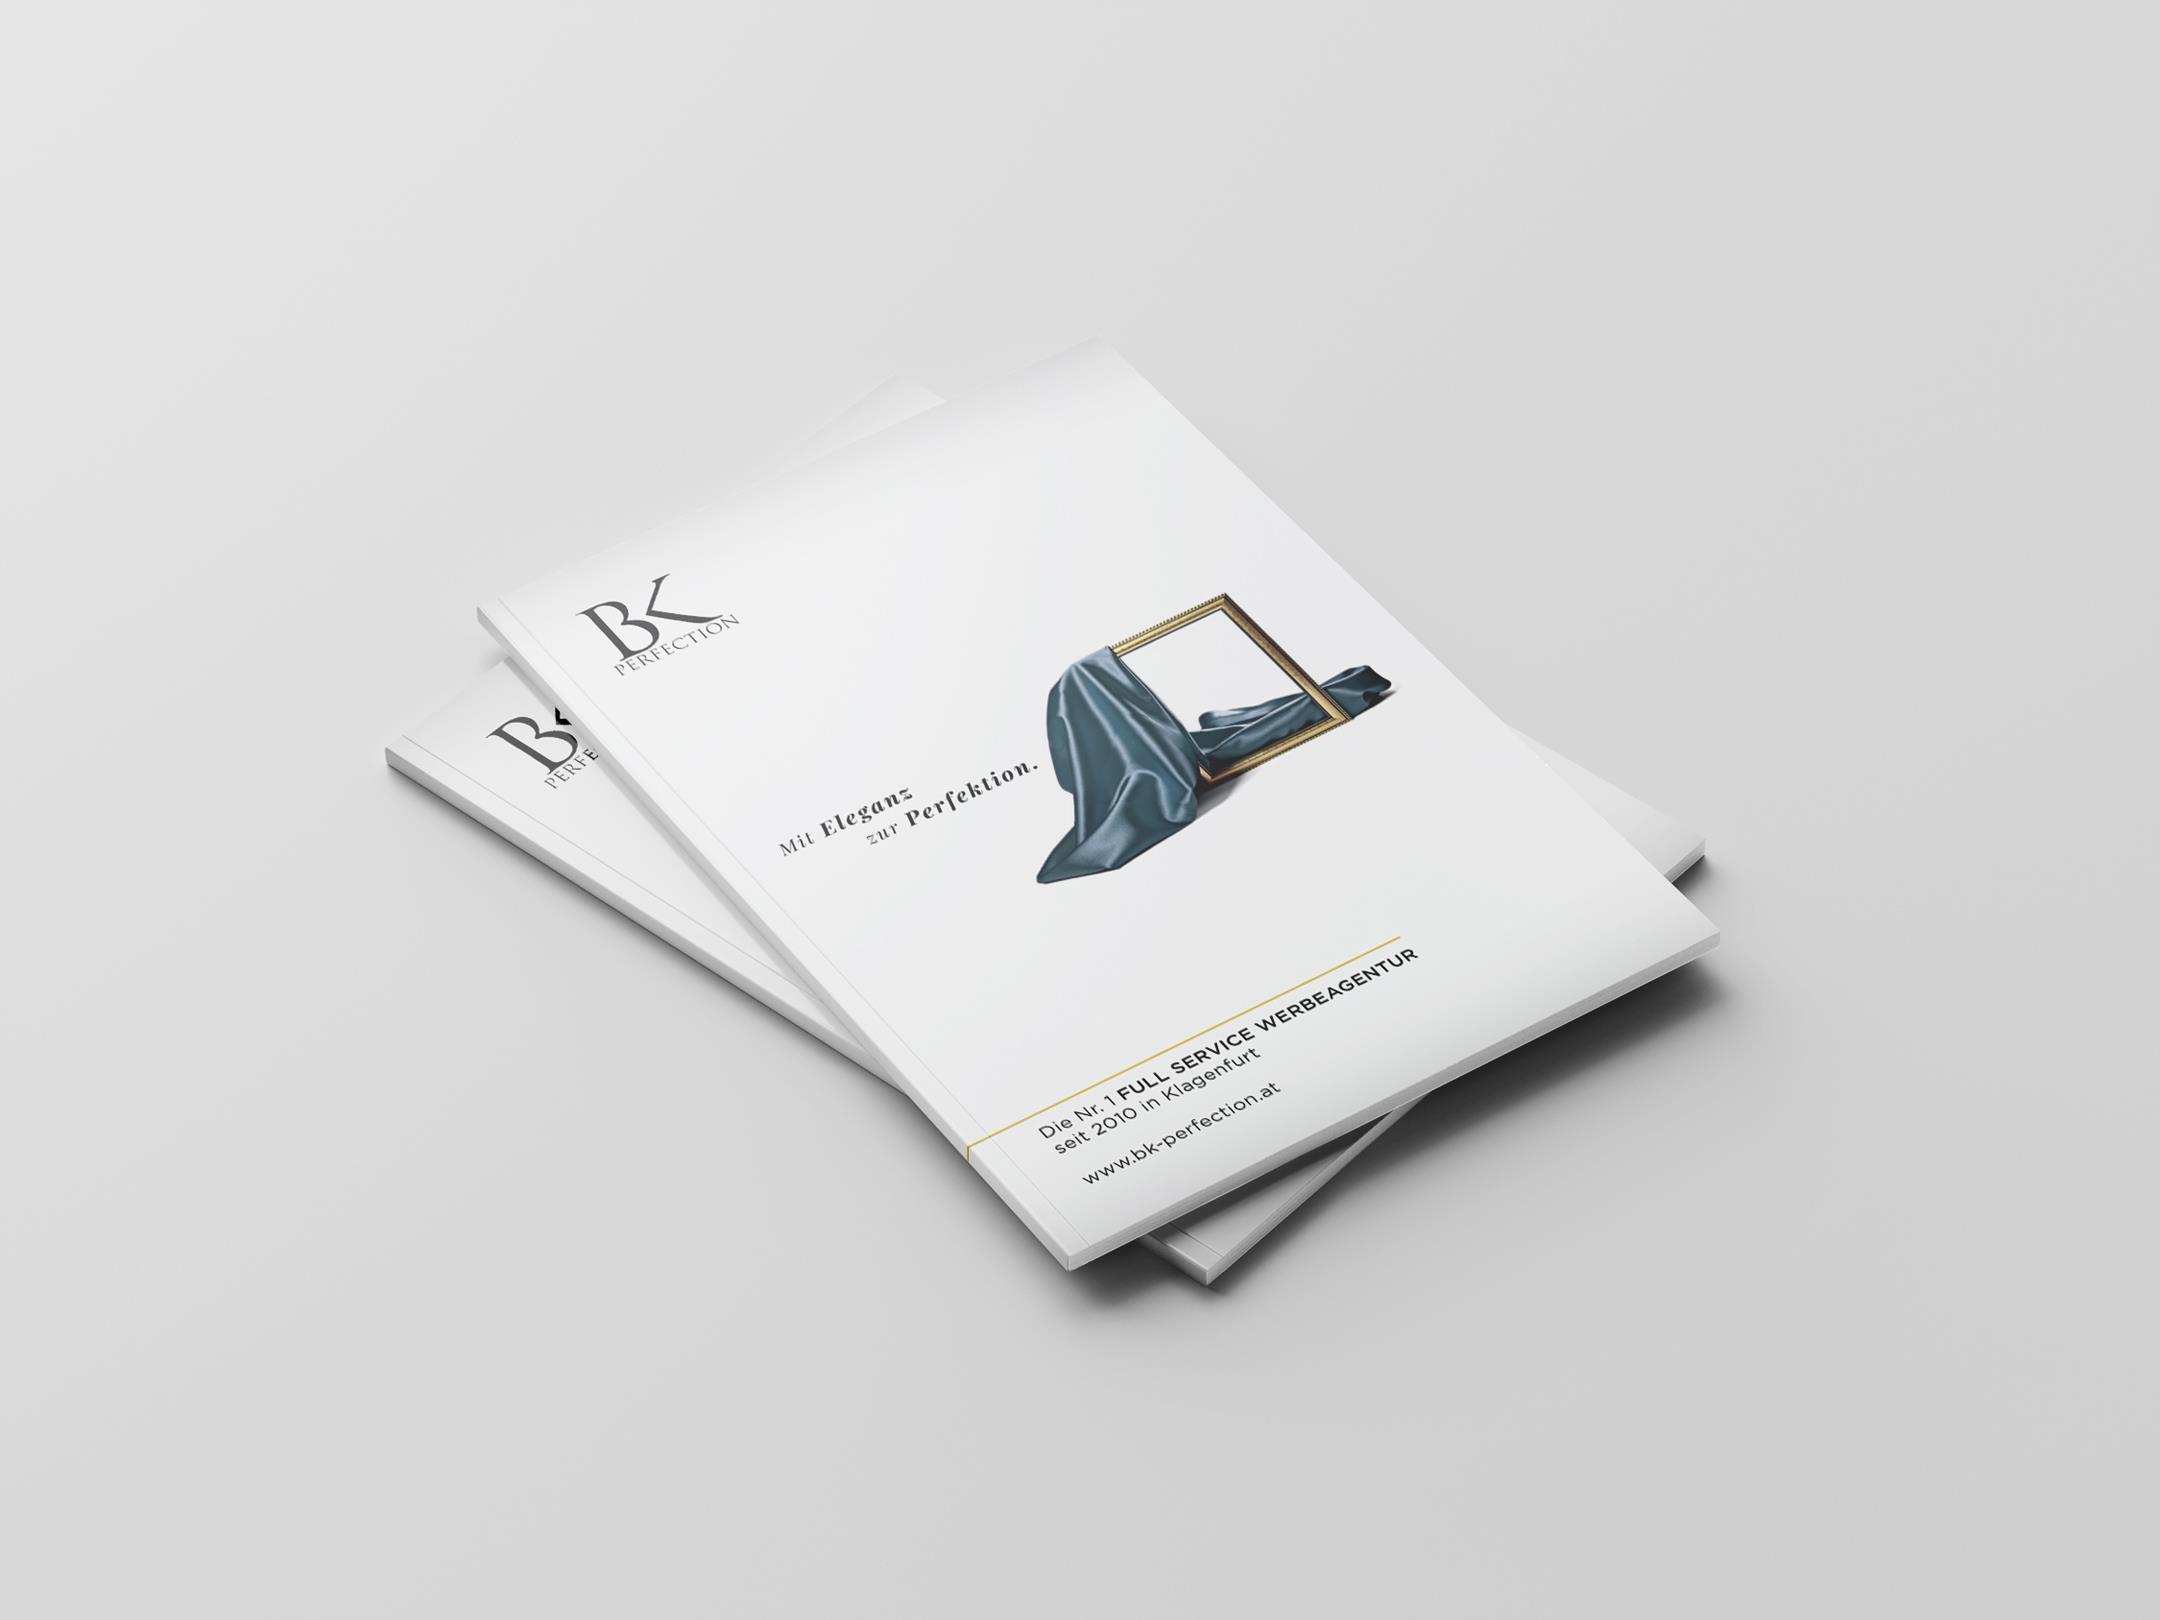 -bk-perfection-broschüre-mockup-12160×1620